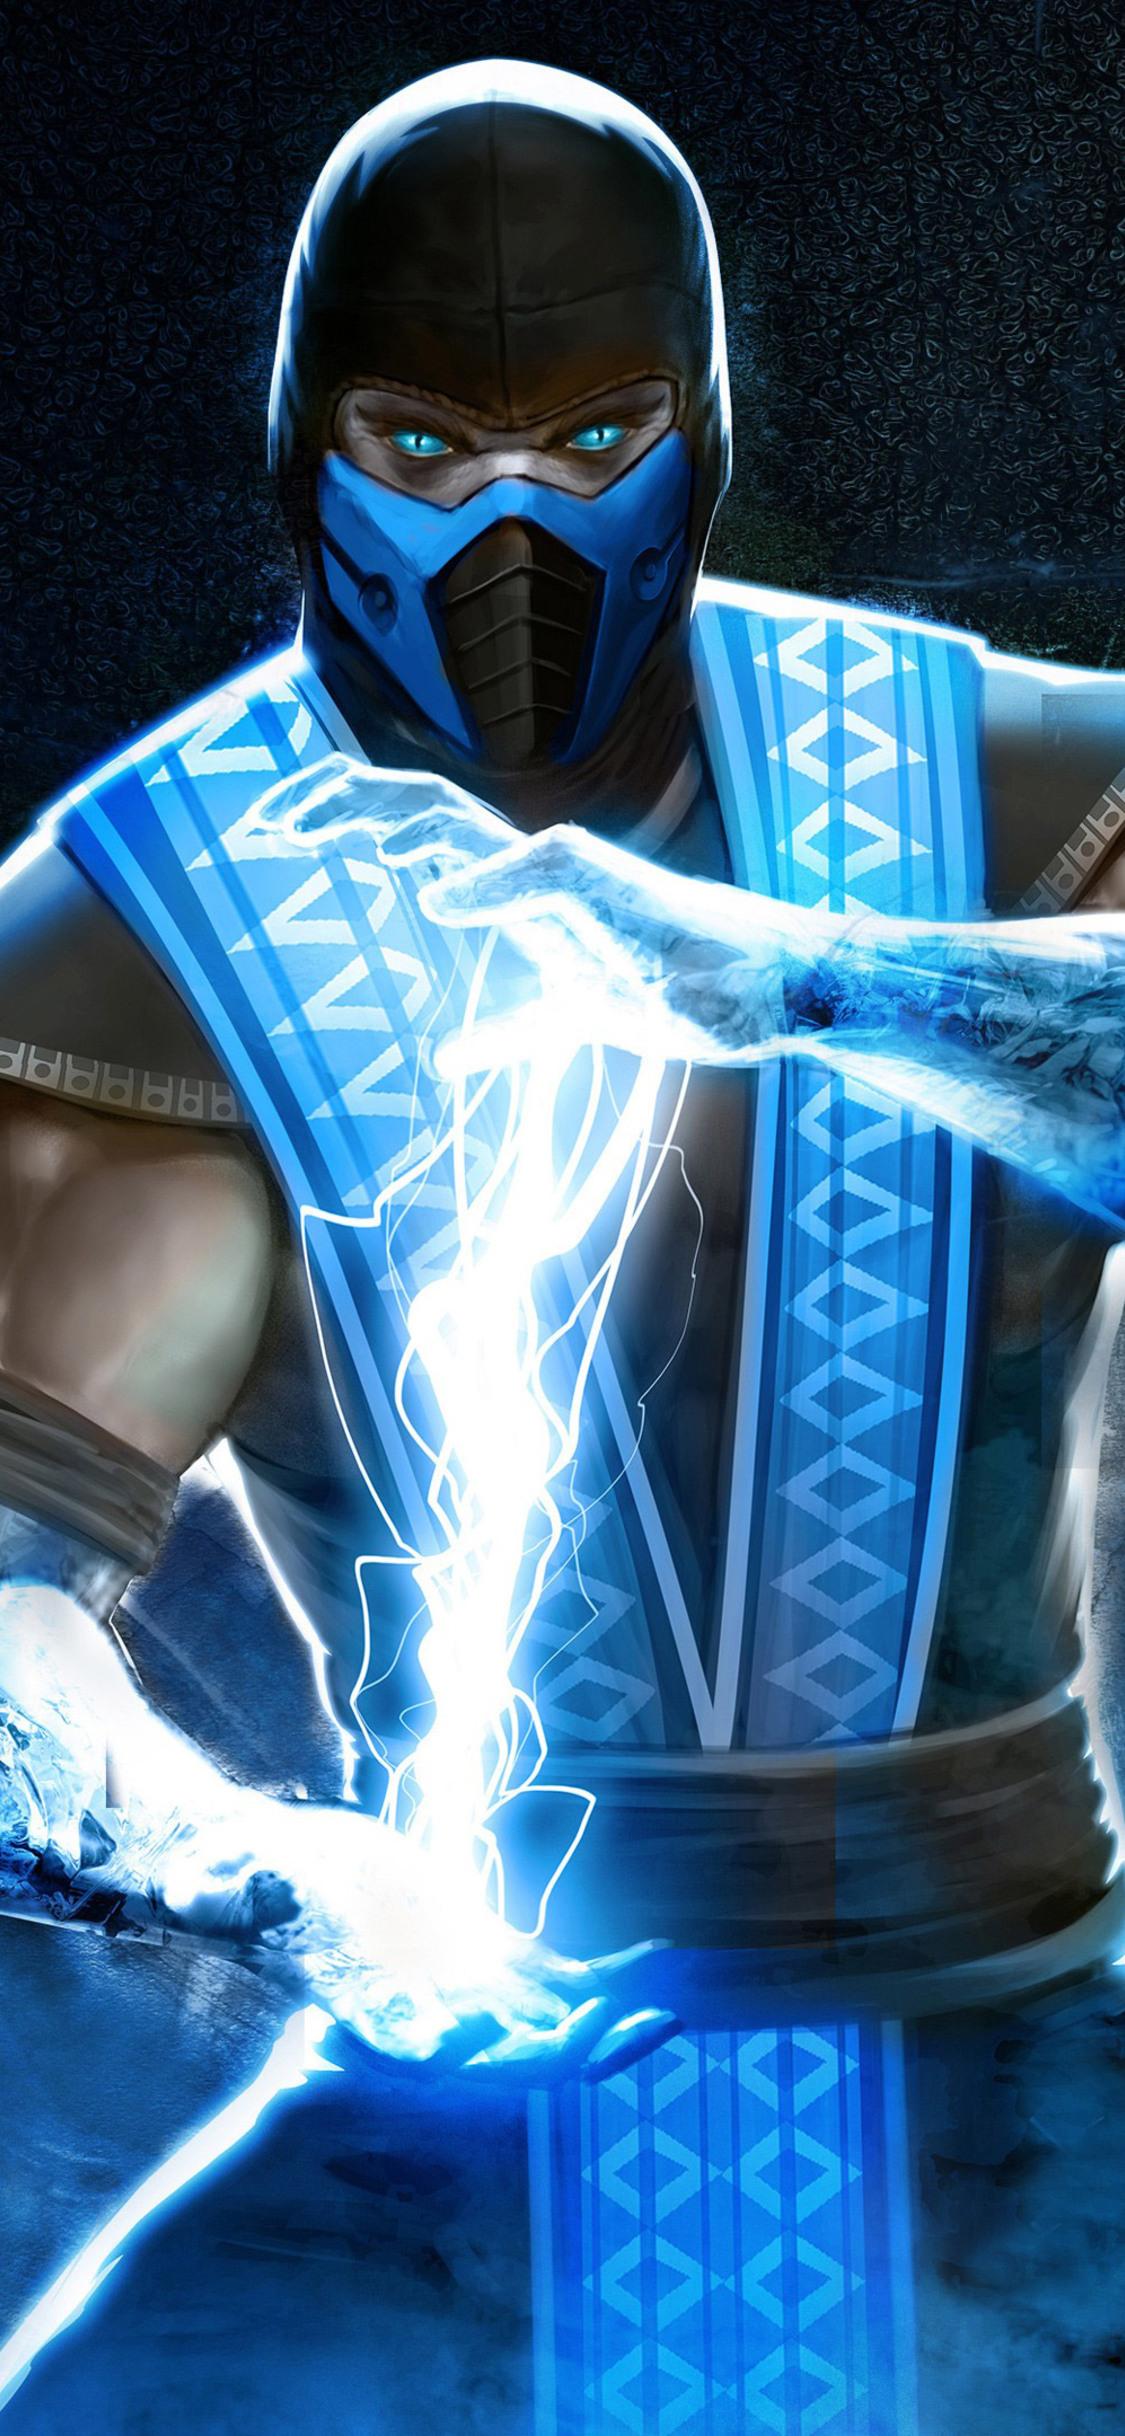 1125x2436 Sub Zero In Mortal Kombat 4k Iphone XS,Iphone 10 ...